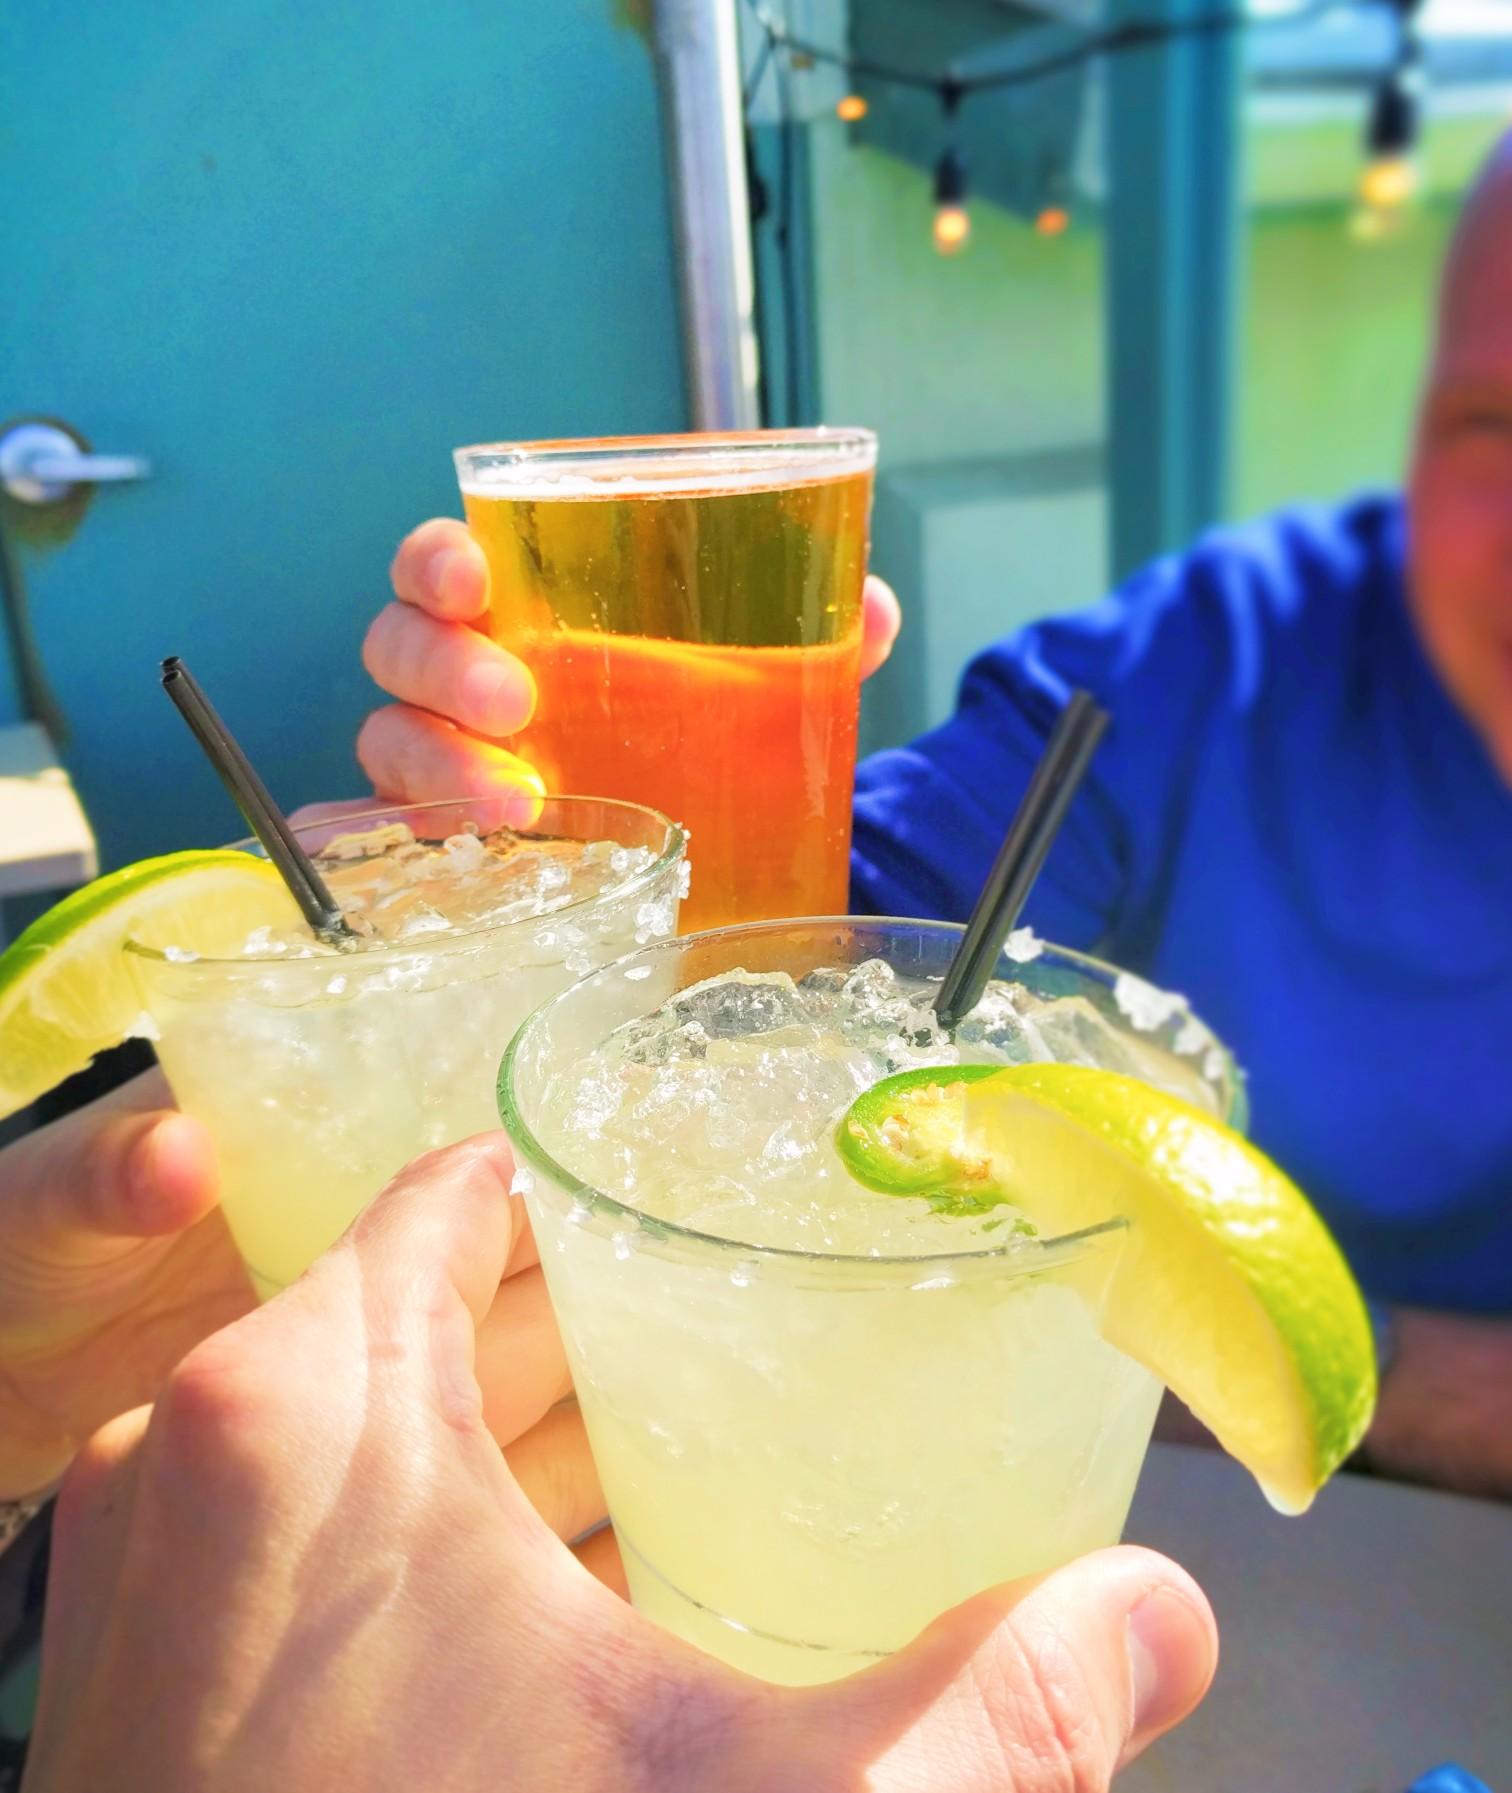 Jalapeno Margaritas at Ristorante Al Mar on Santa Monica Pier 2